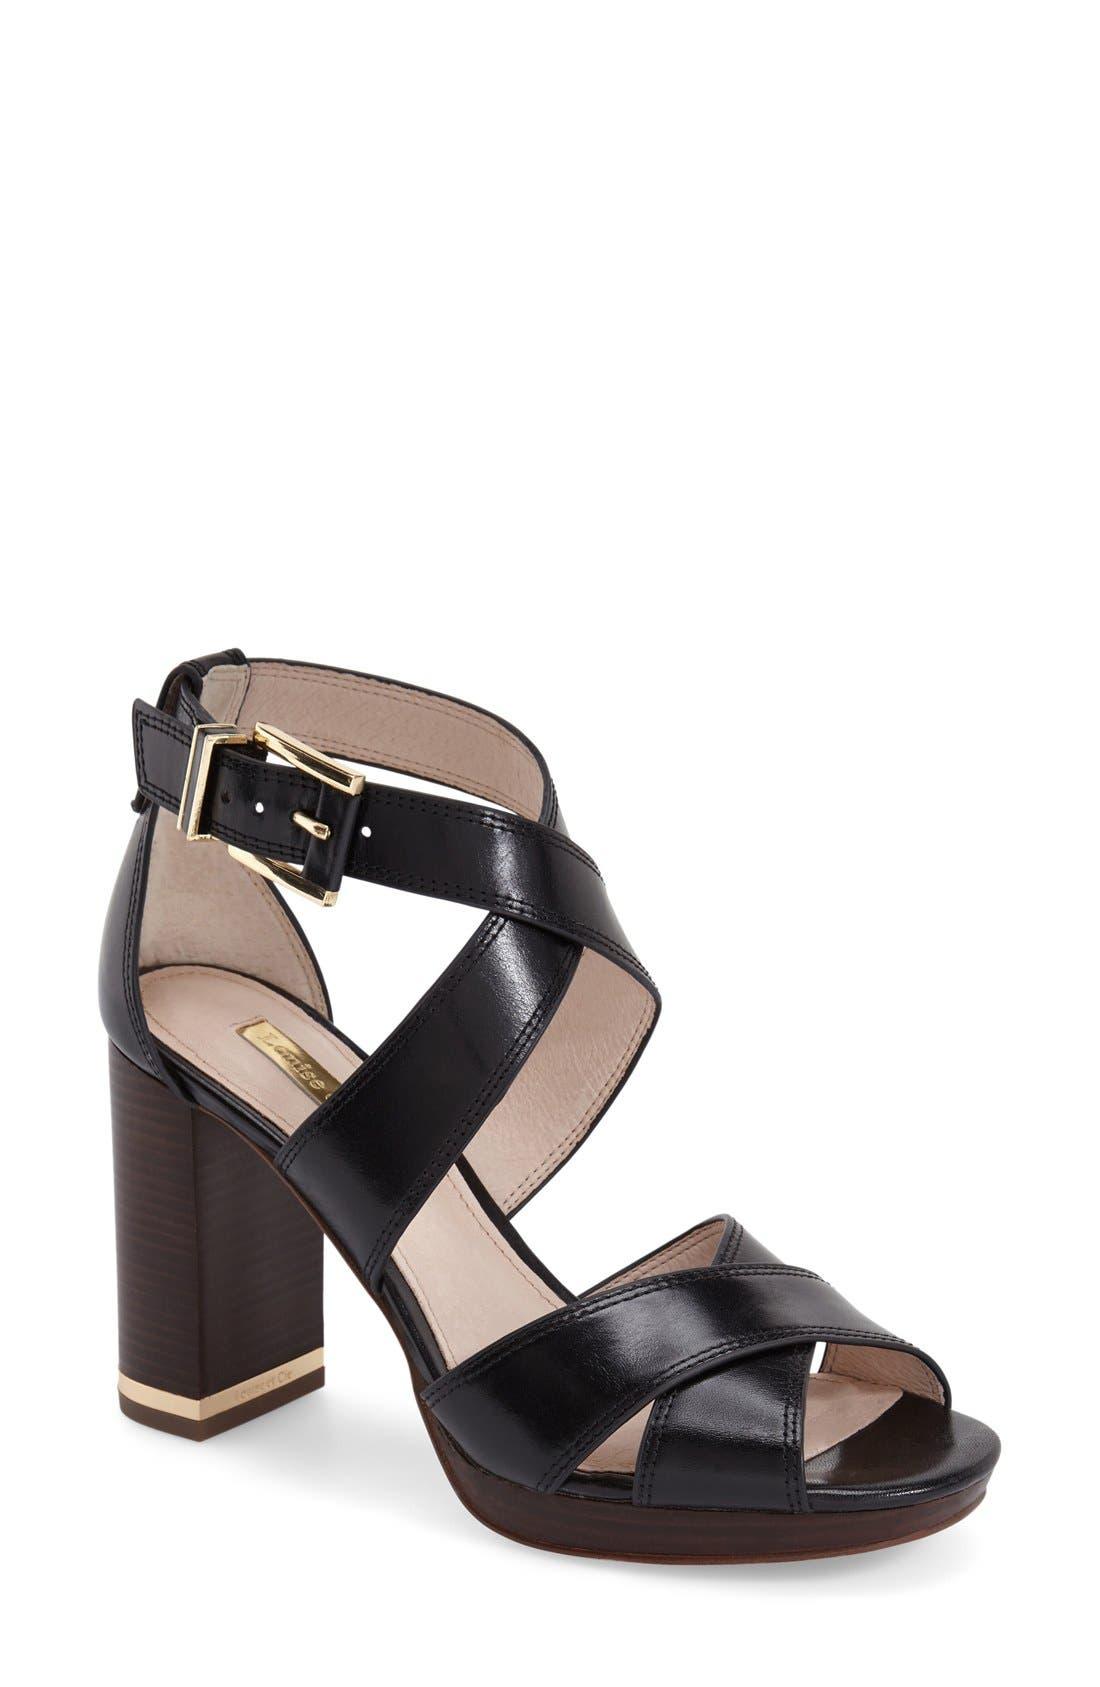 Alternate Image 1 Selected - Louise et Cie 'Gigi' Platform Sandal (Women)